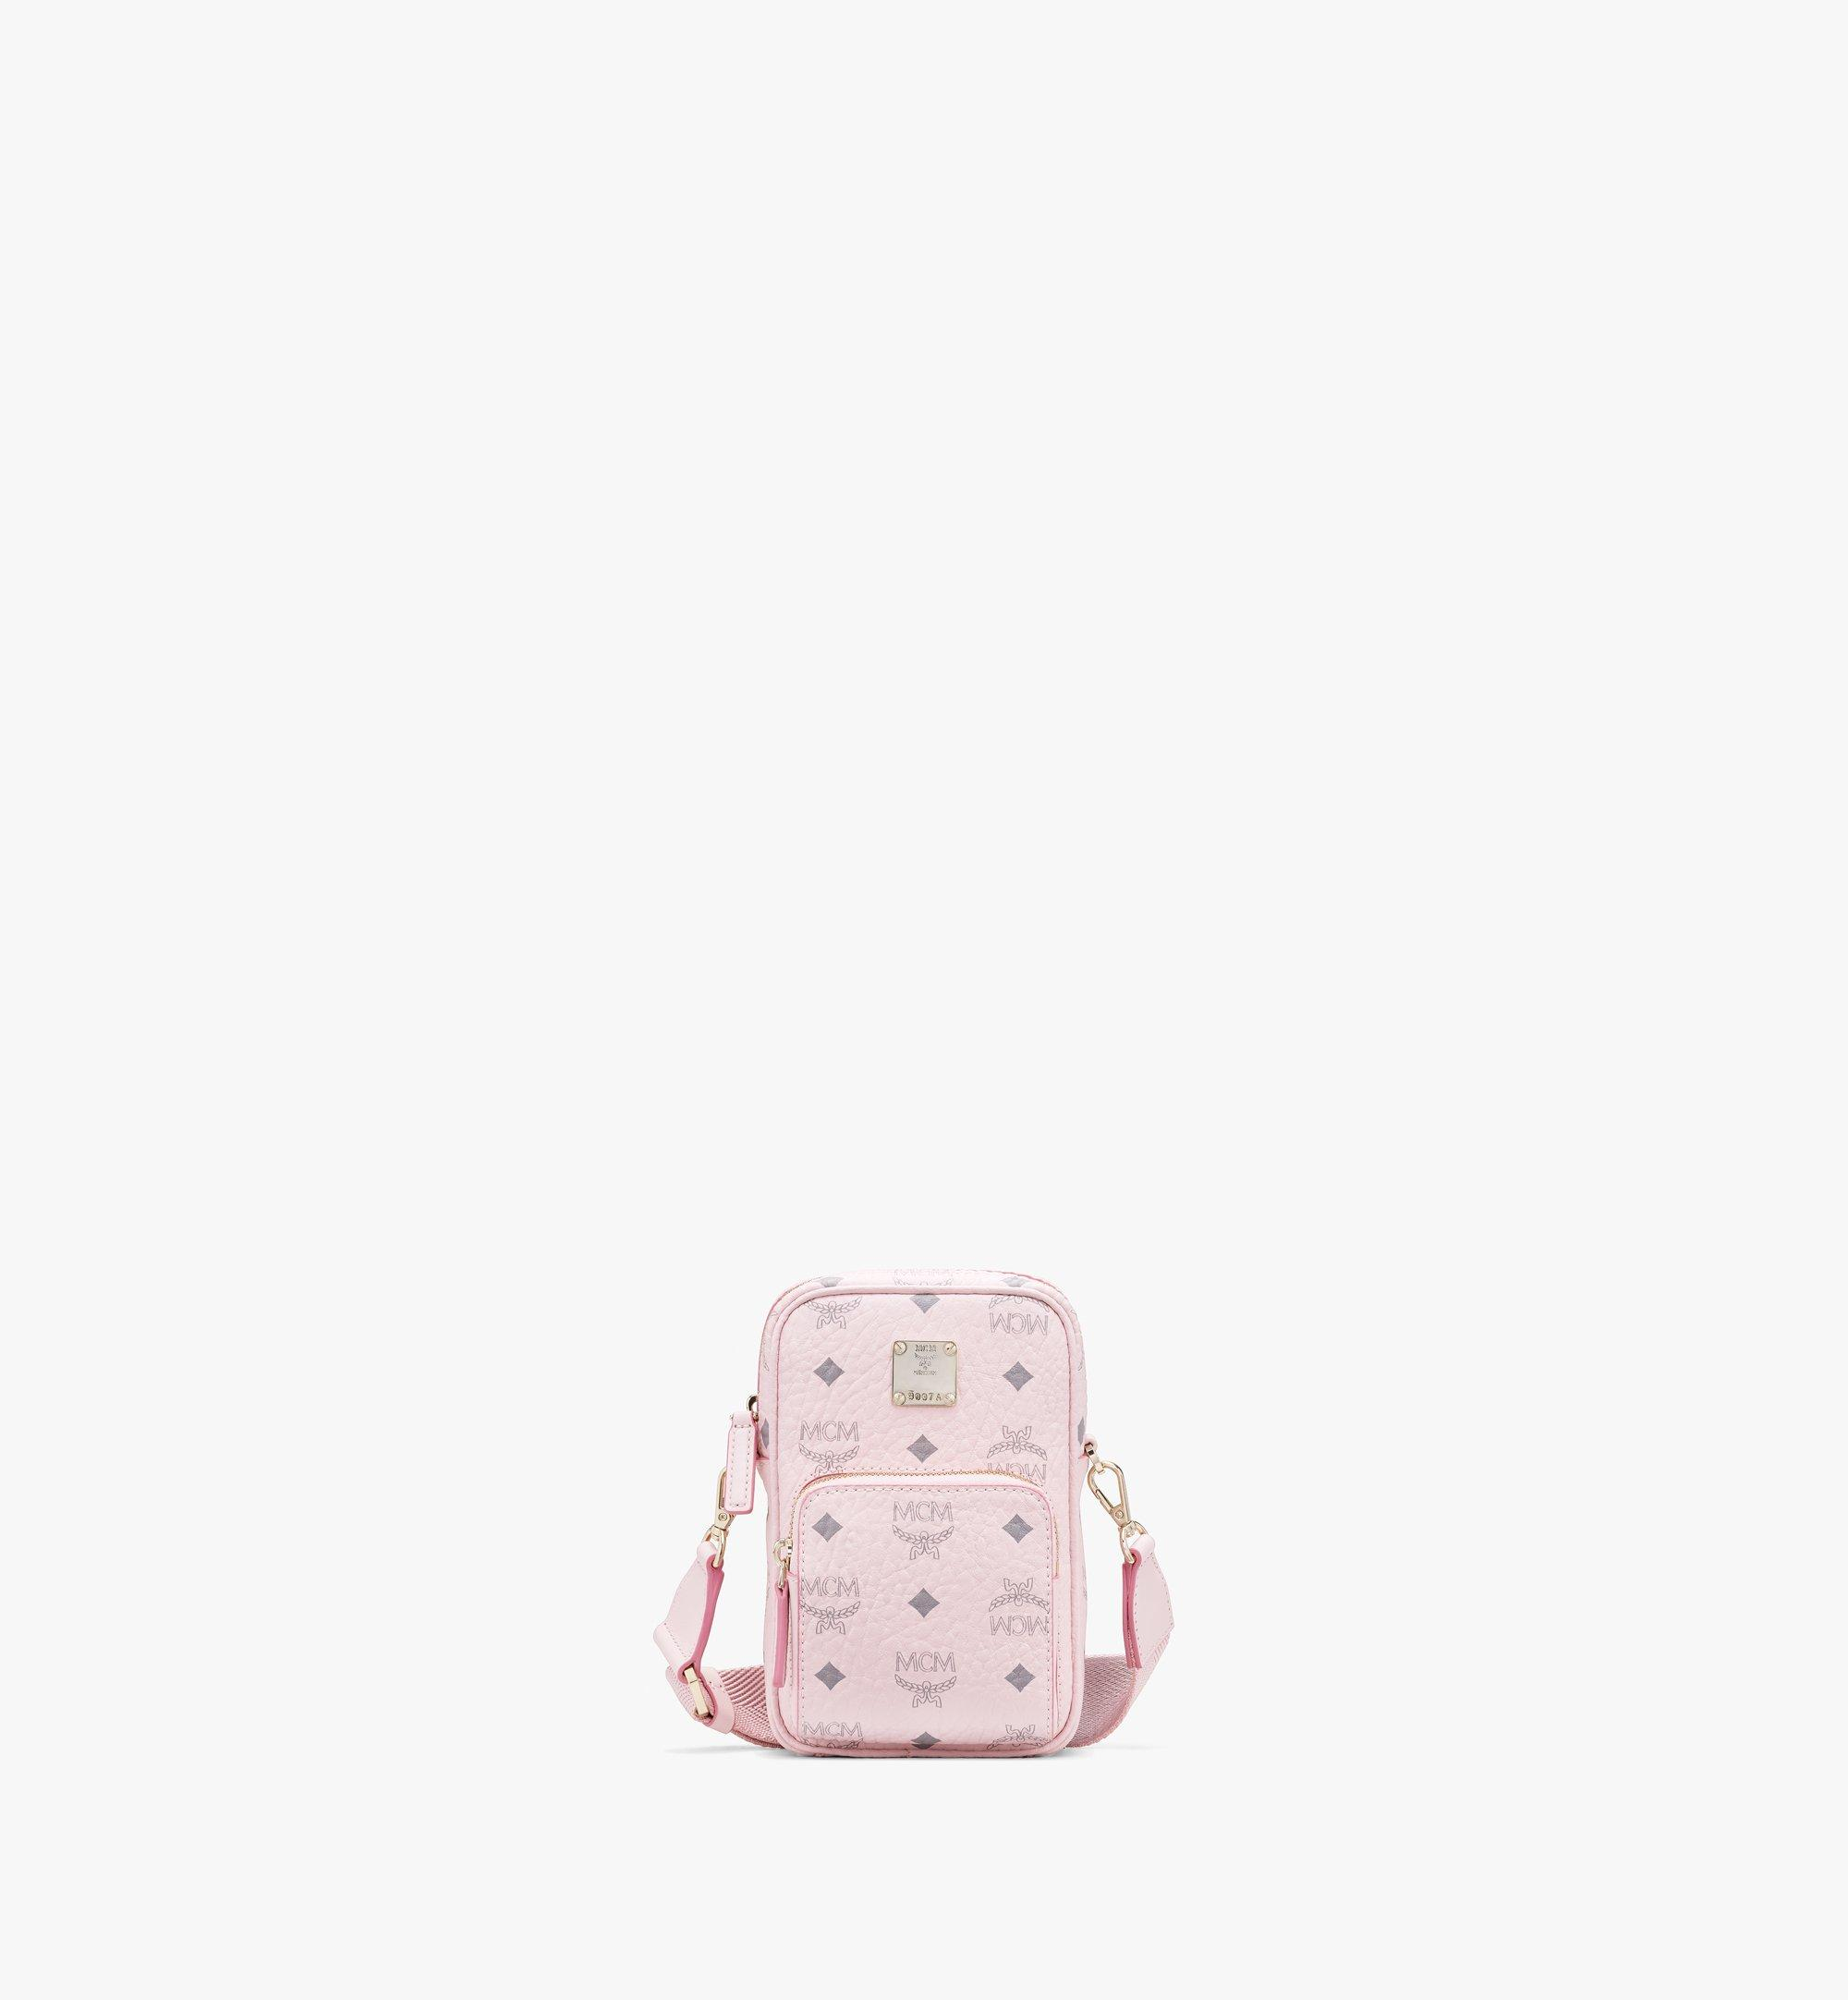 Mini Tech Crossbody Tasche in Visetos Original Rosa | MCM® DE